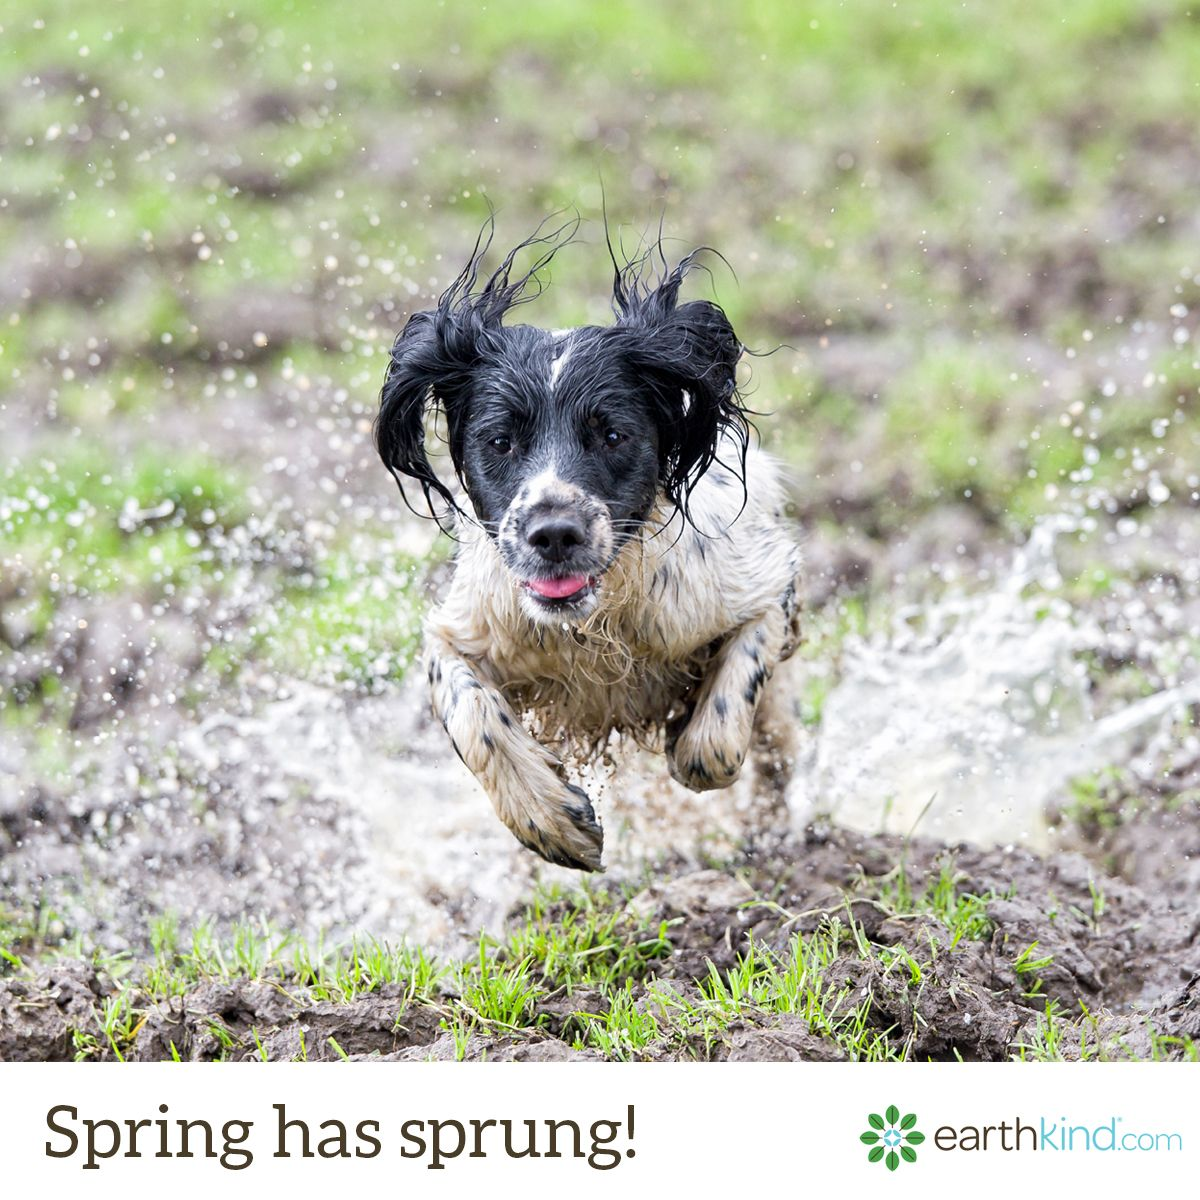 Medium Crop Of Wet Dog Smell